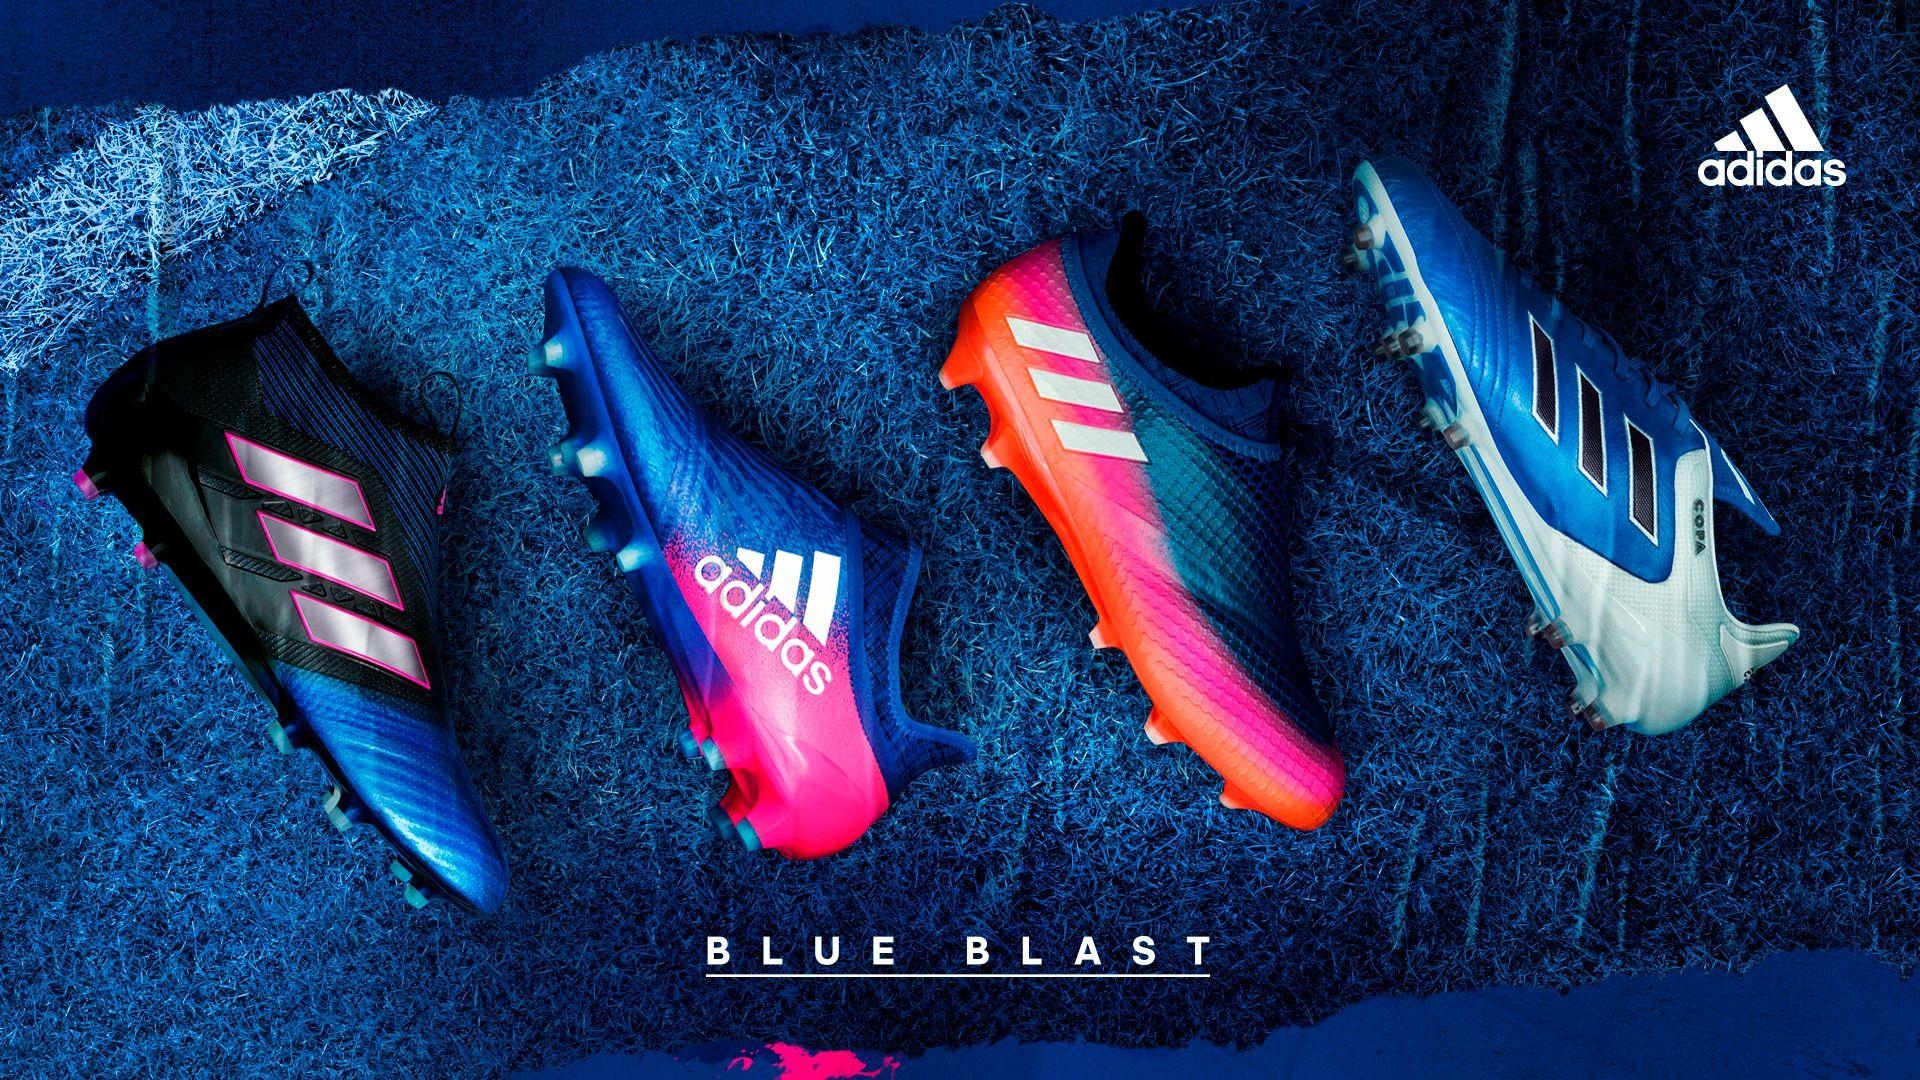 adidas logo cool, adidas images